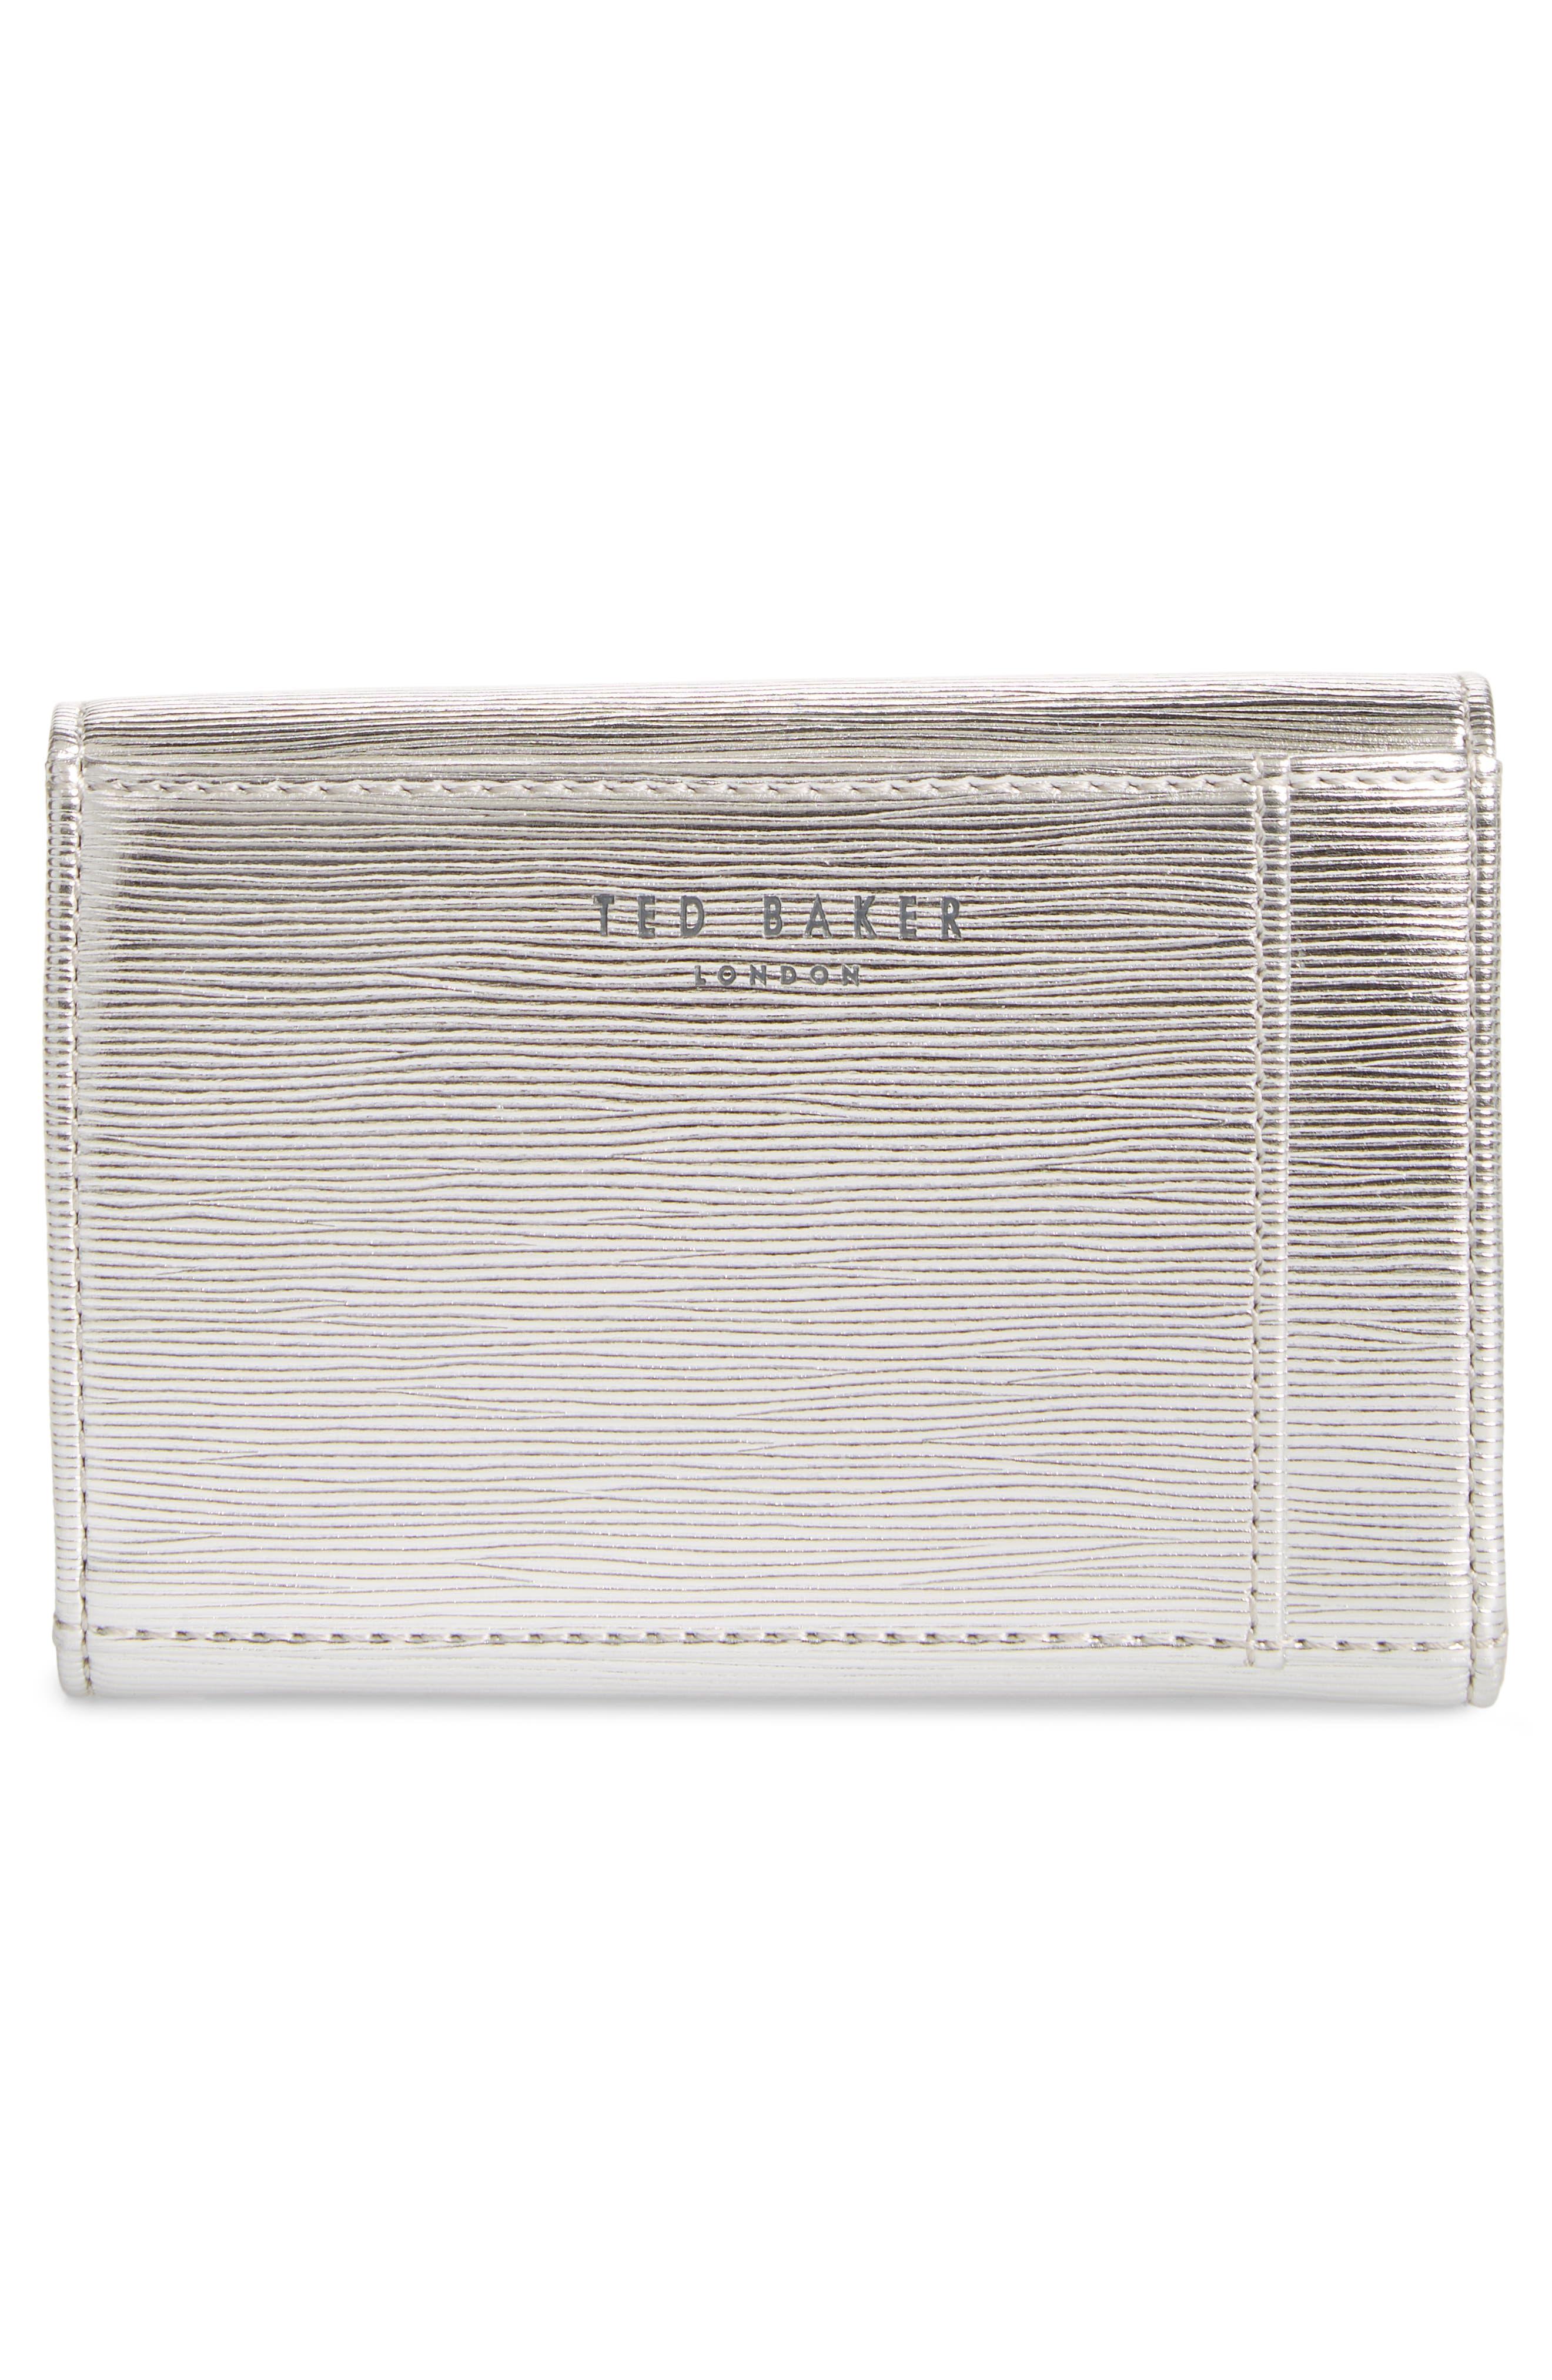 Valenta Plissé Leather Mini Wallet,                             Alternate thumbnail 4, color,                             Silver